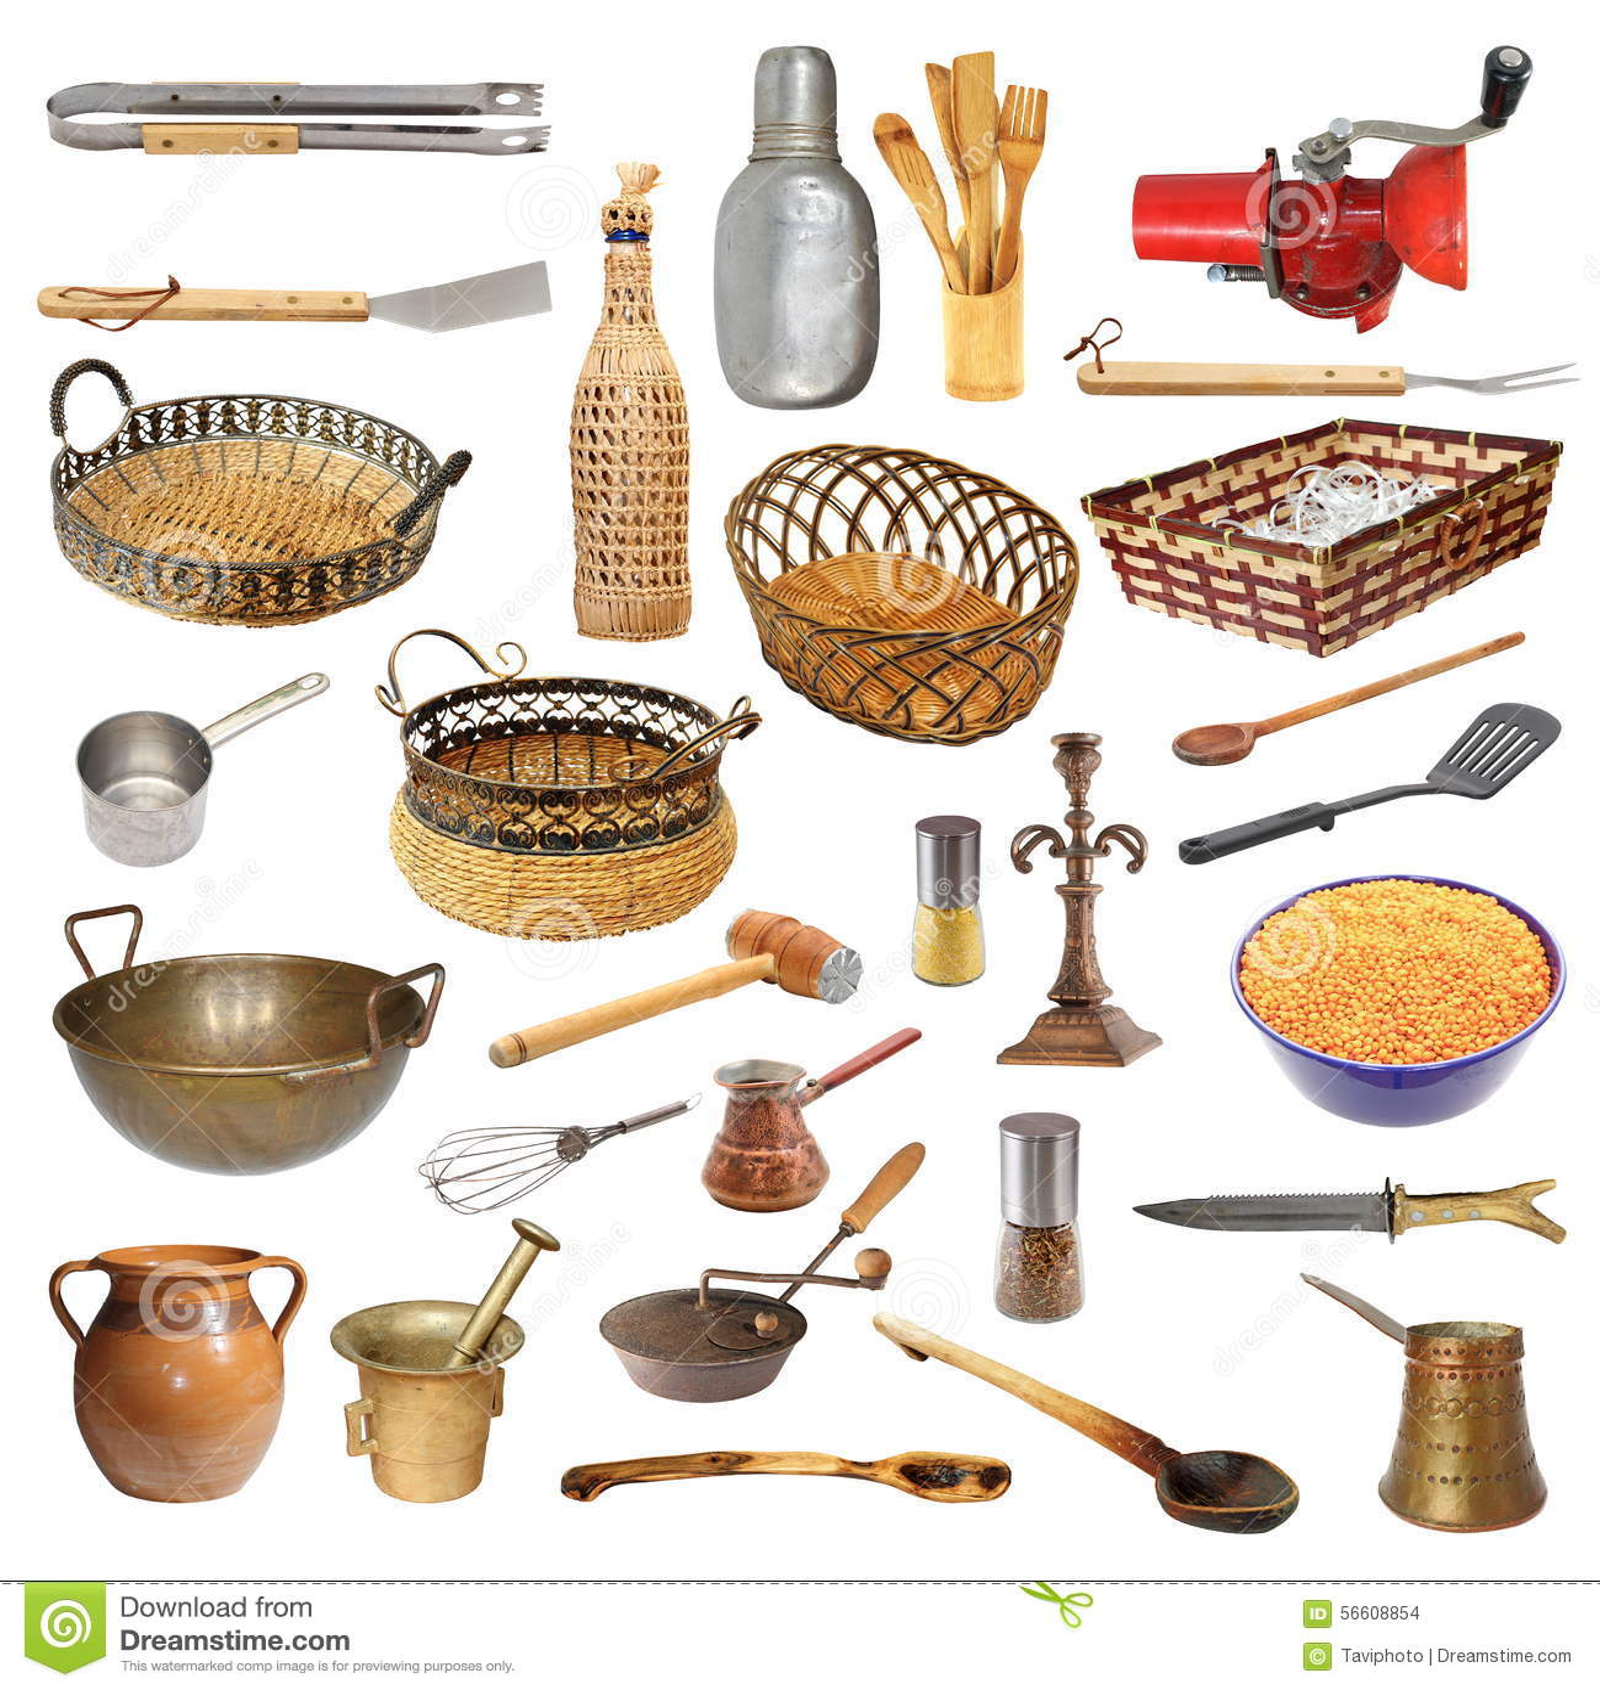 collection de diff rents ustensiles et objets de cuisine photo stock image 56608854. Black Bedroom Furniture Sets. Home Design Ideas